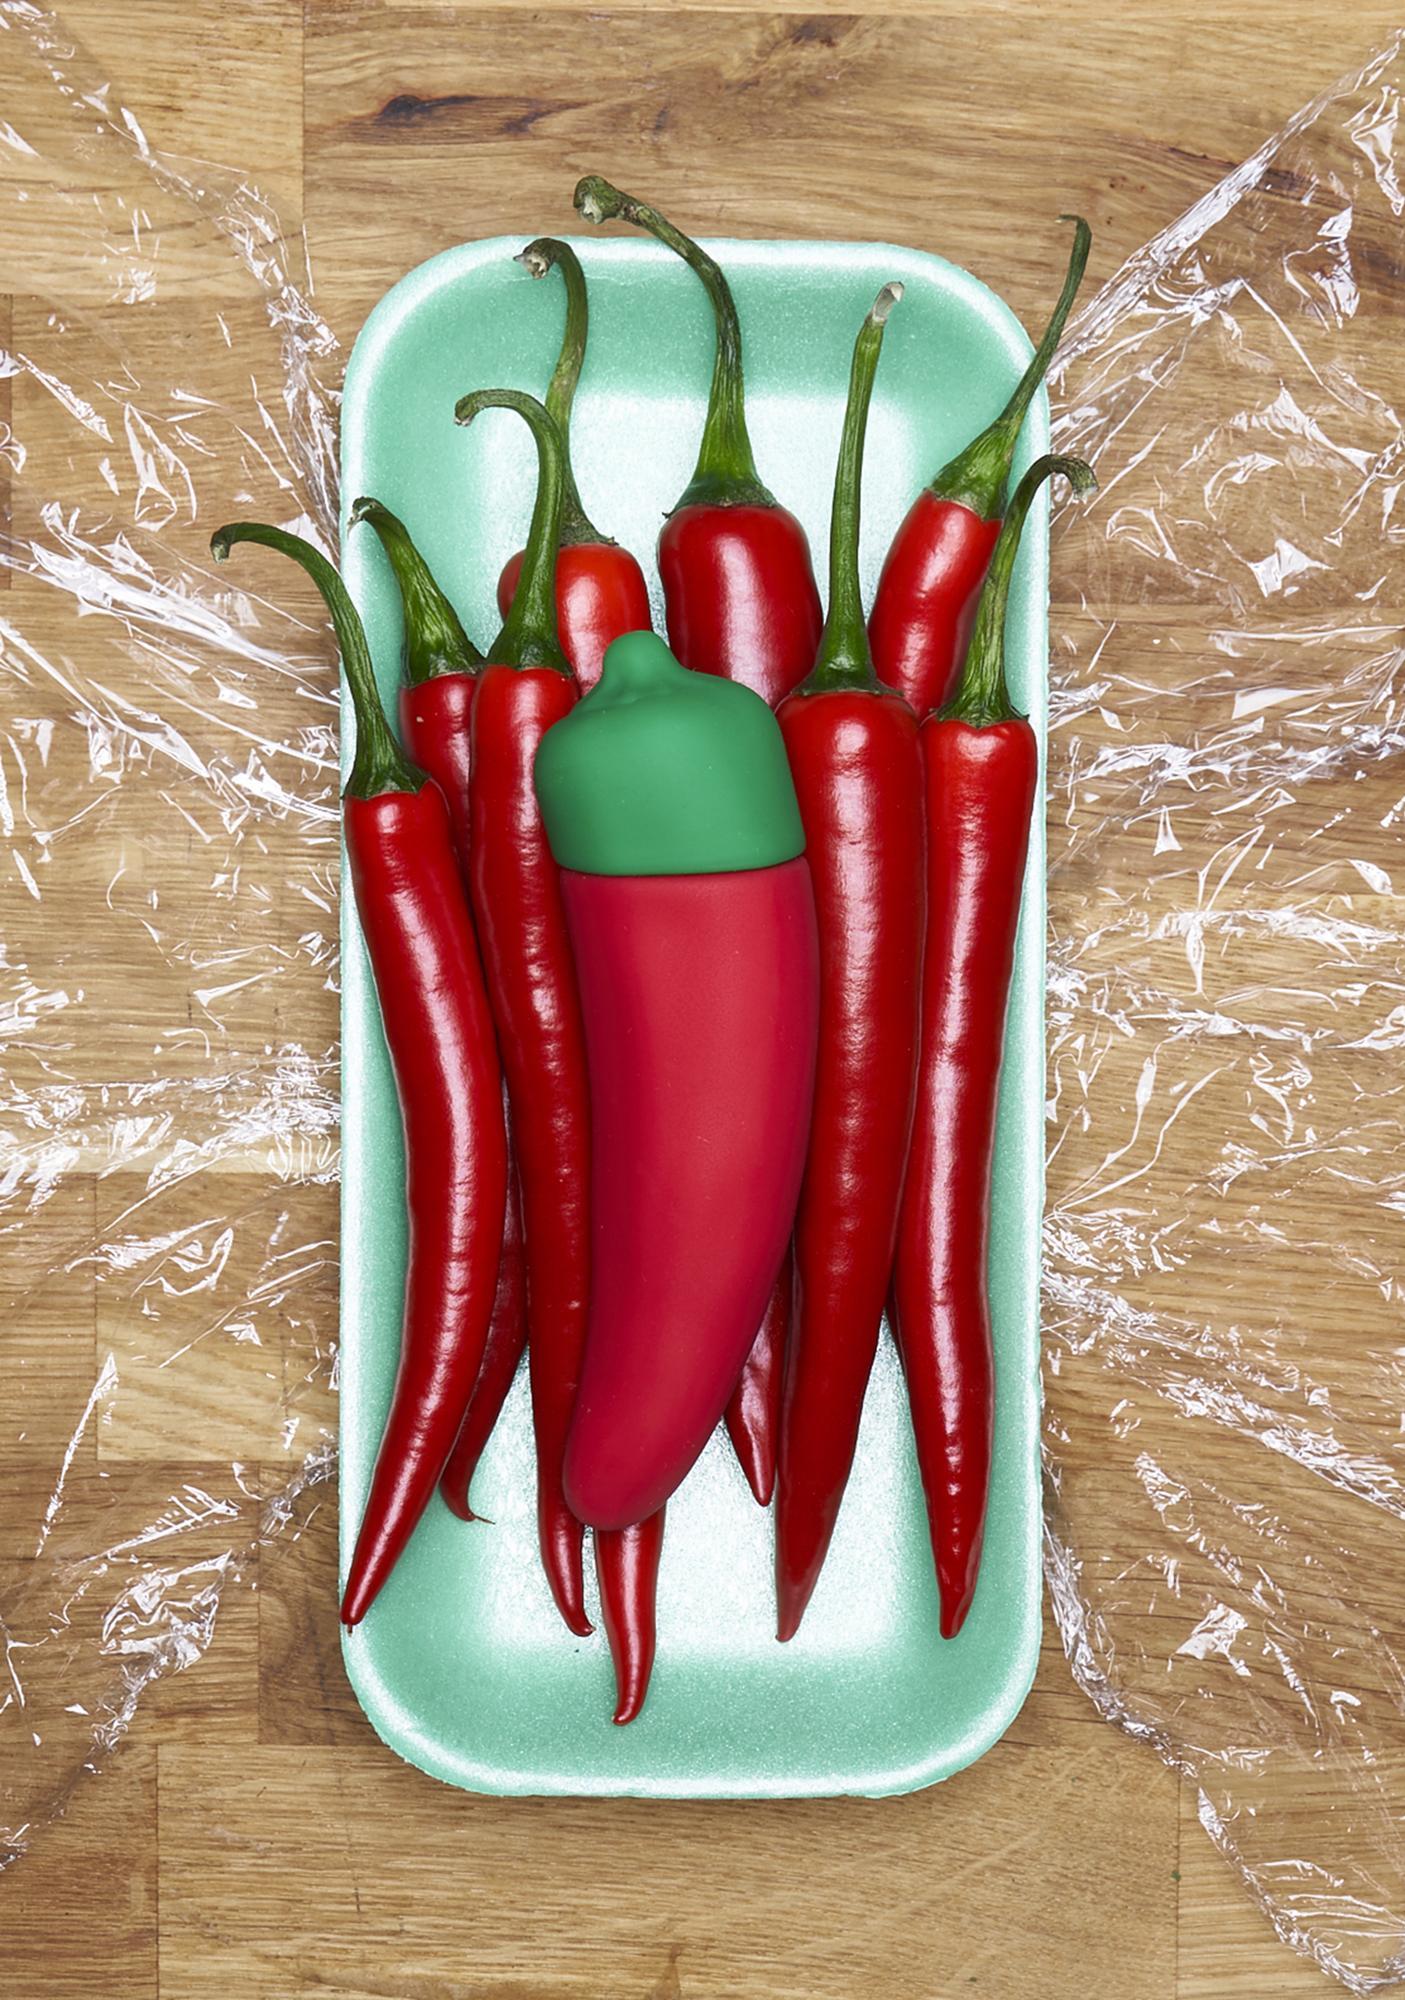 Emojibator The Chili Pepper Emojibator Vibrator